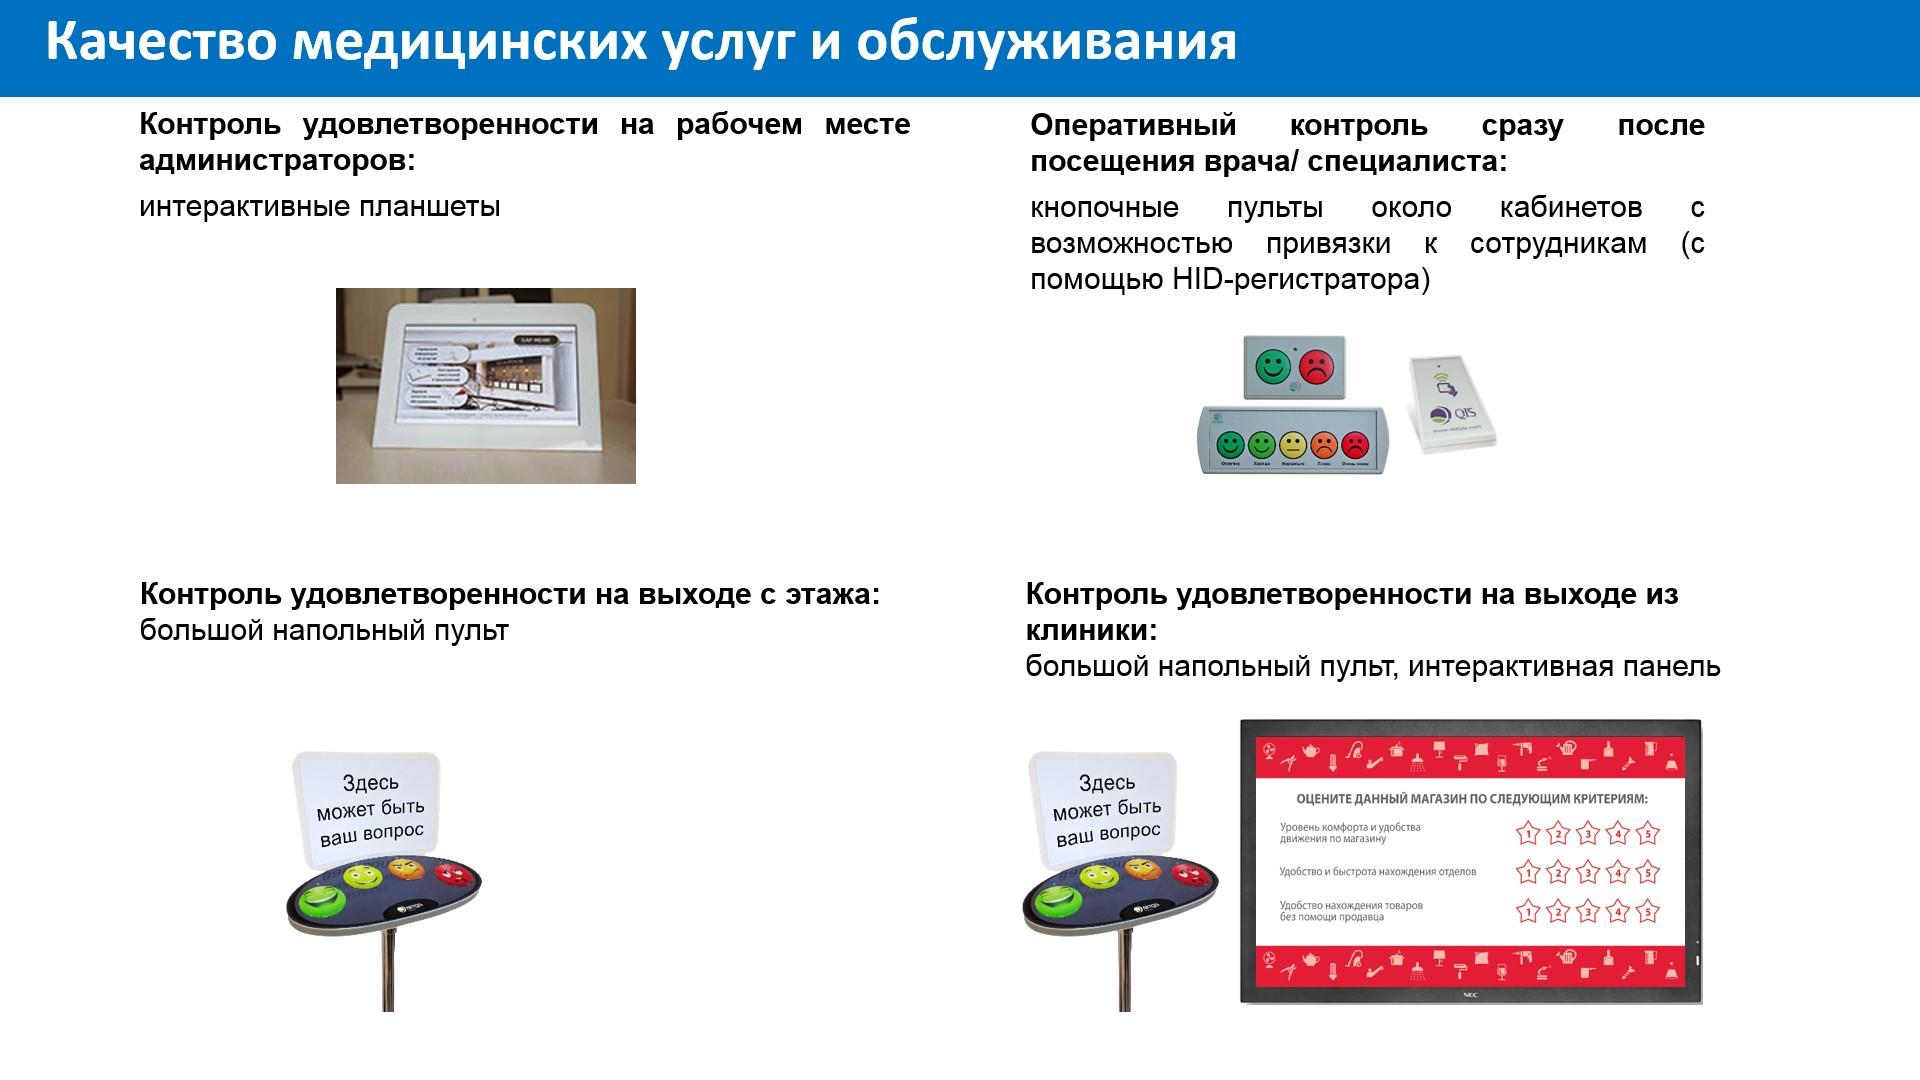 качество медицинских услуг и обслуживания_NETQIS